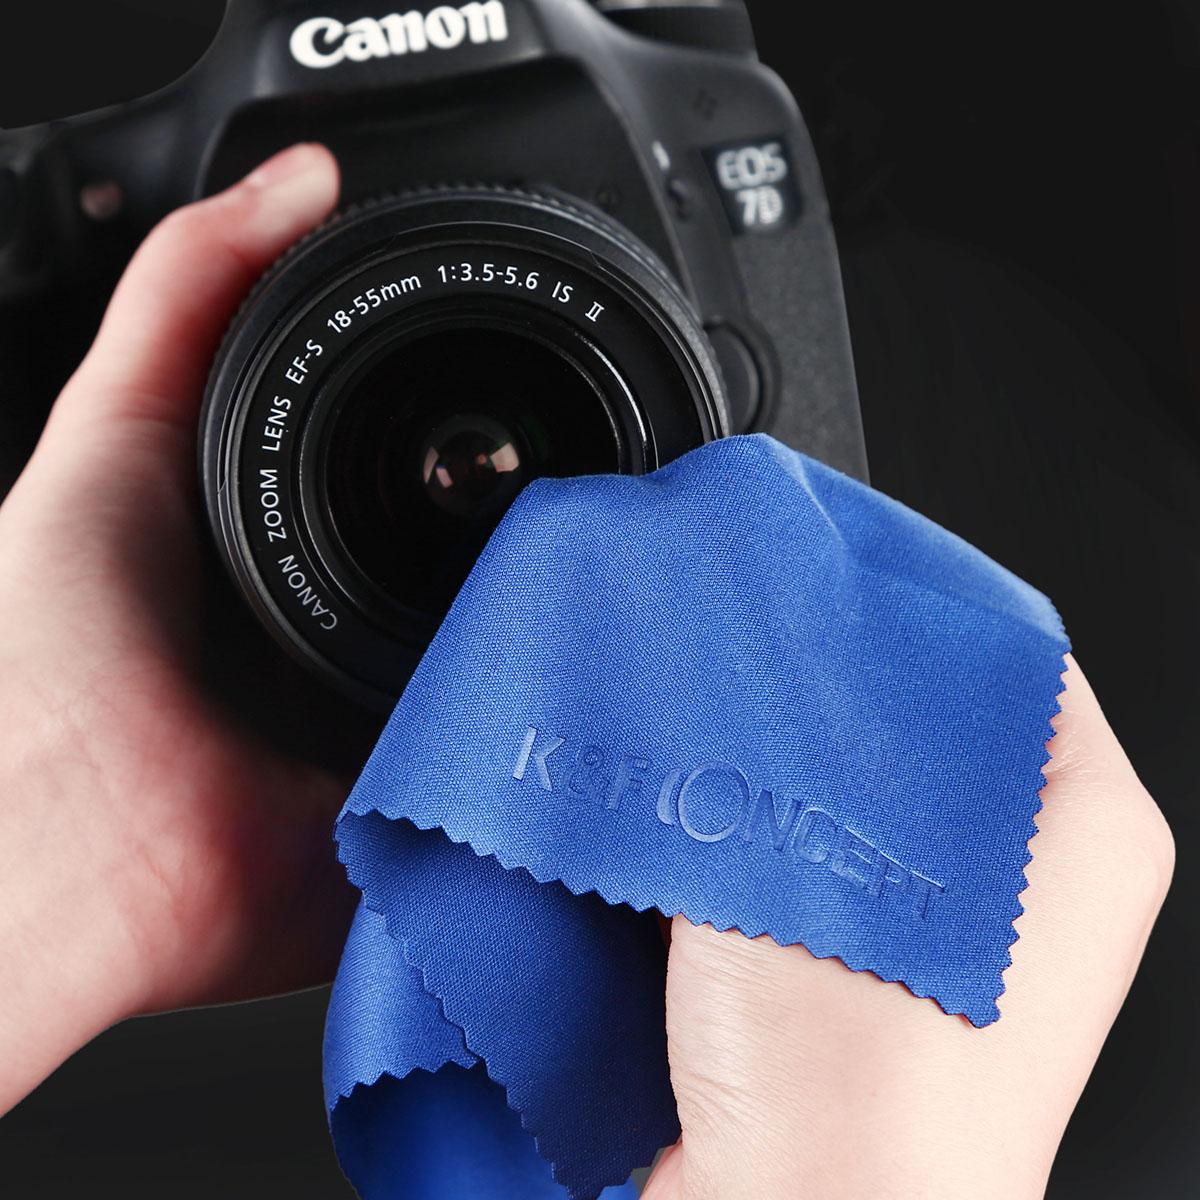 7in1 DSLR-reinigingsset voor camera (reinigingspen + luchtblazer + schoonmaakdoekje + lensreinigingsdoekje + sproeiflacon + droge doekjes + borstel)